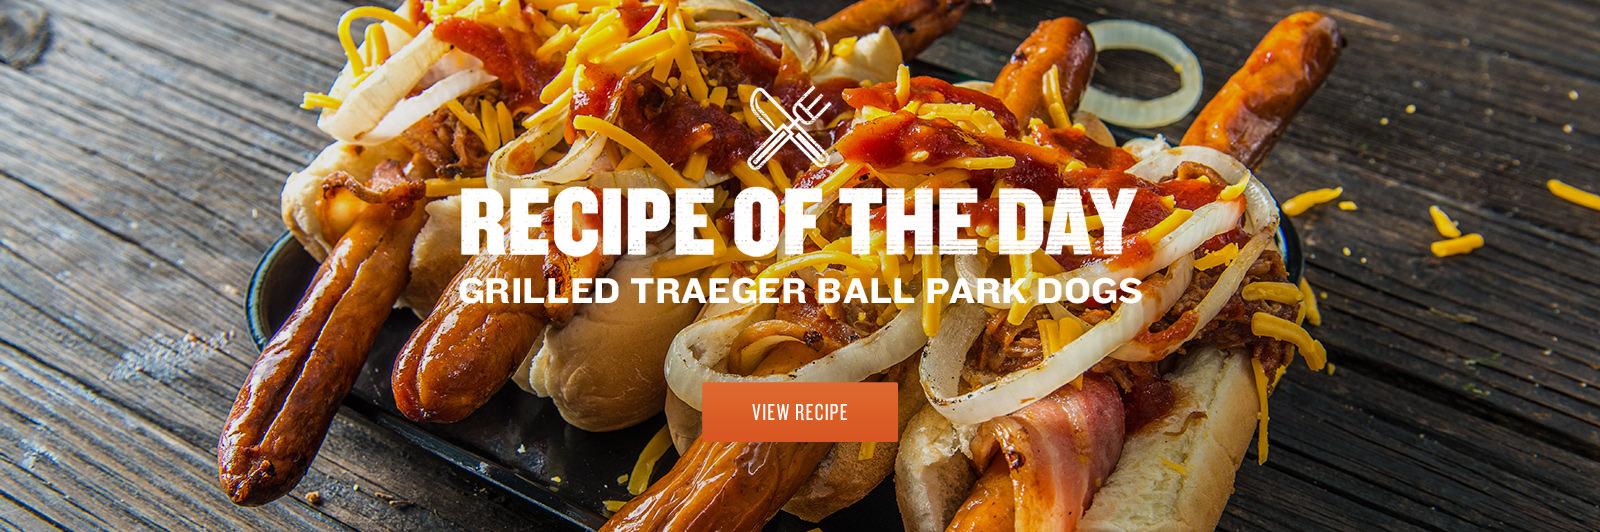 Grilled Traeger Ball Park Dog